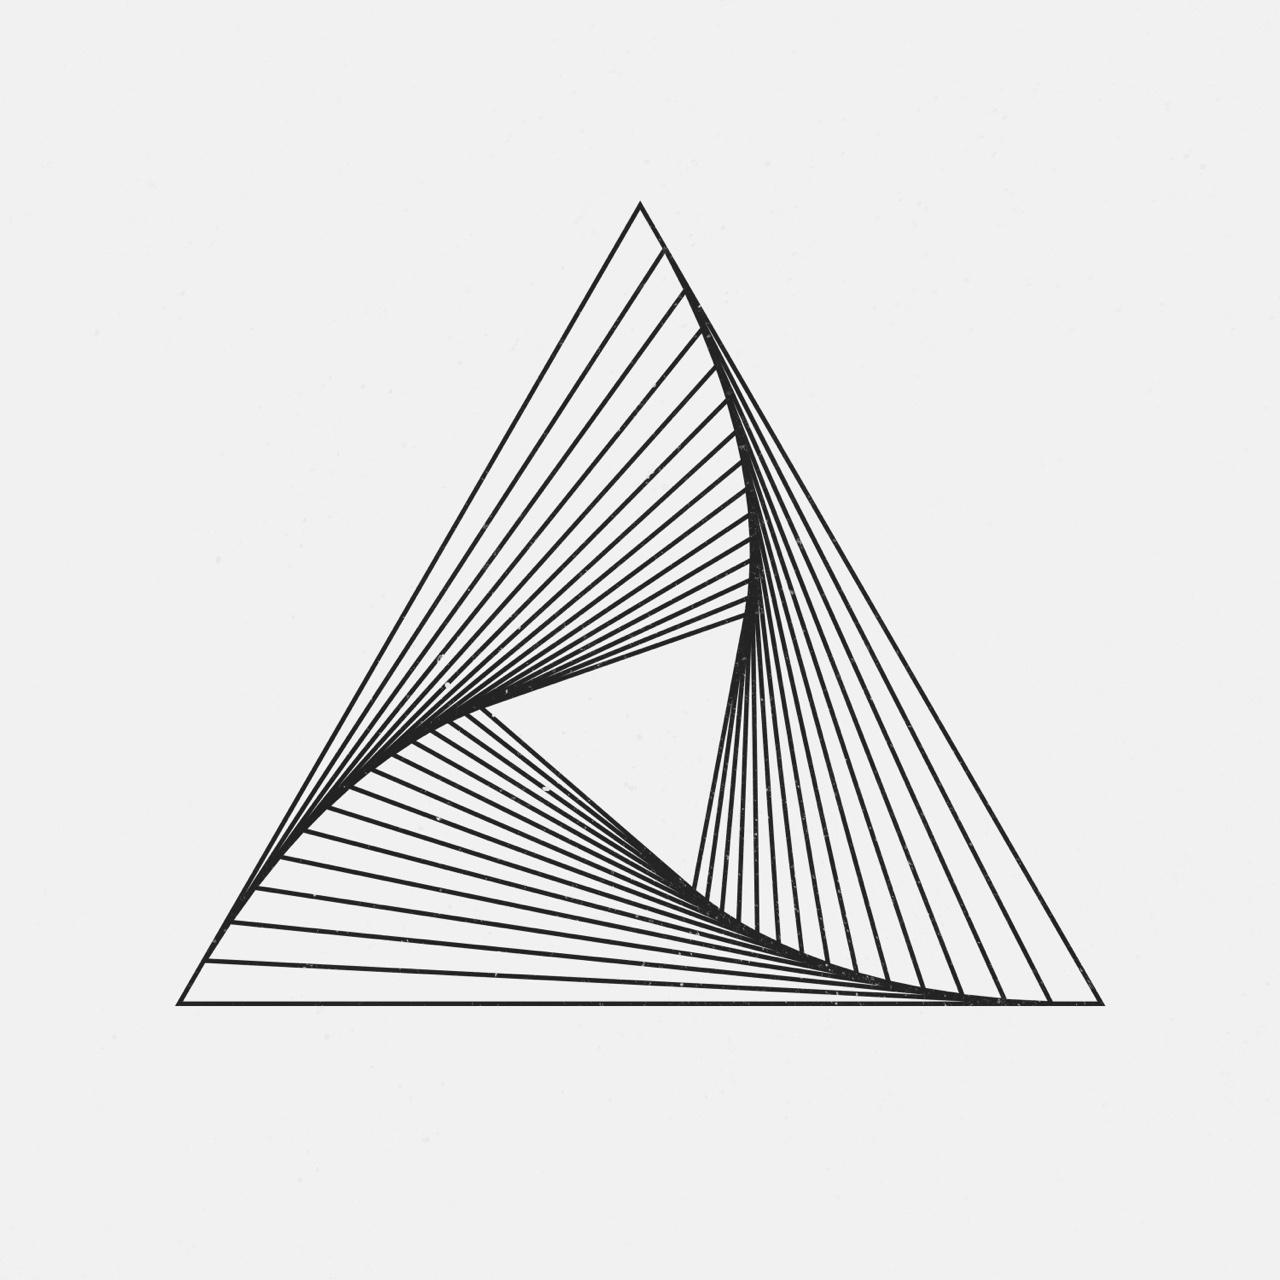 Minimalism viktoria hristova for Minimalist design definition